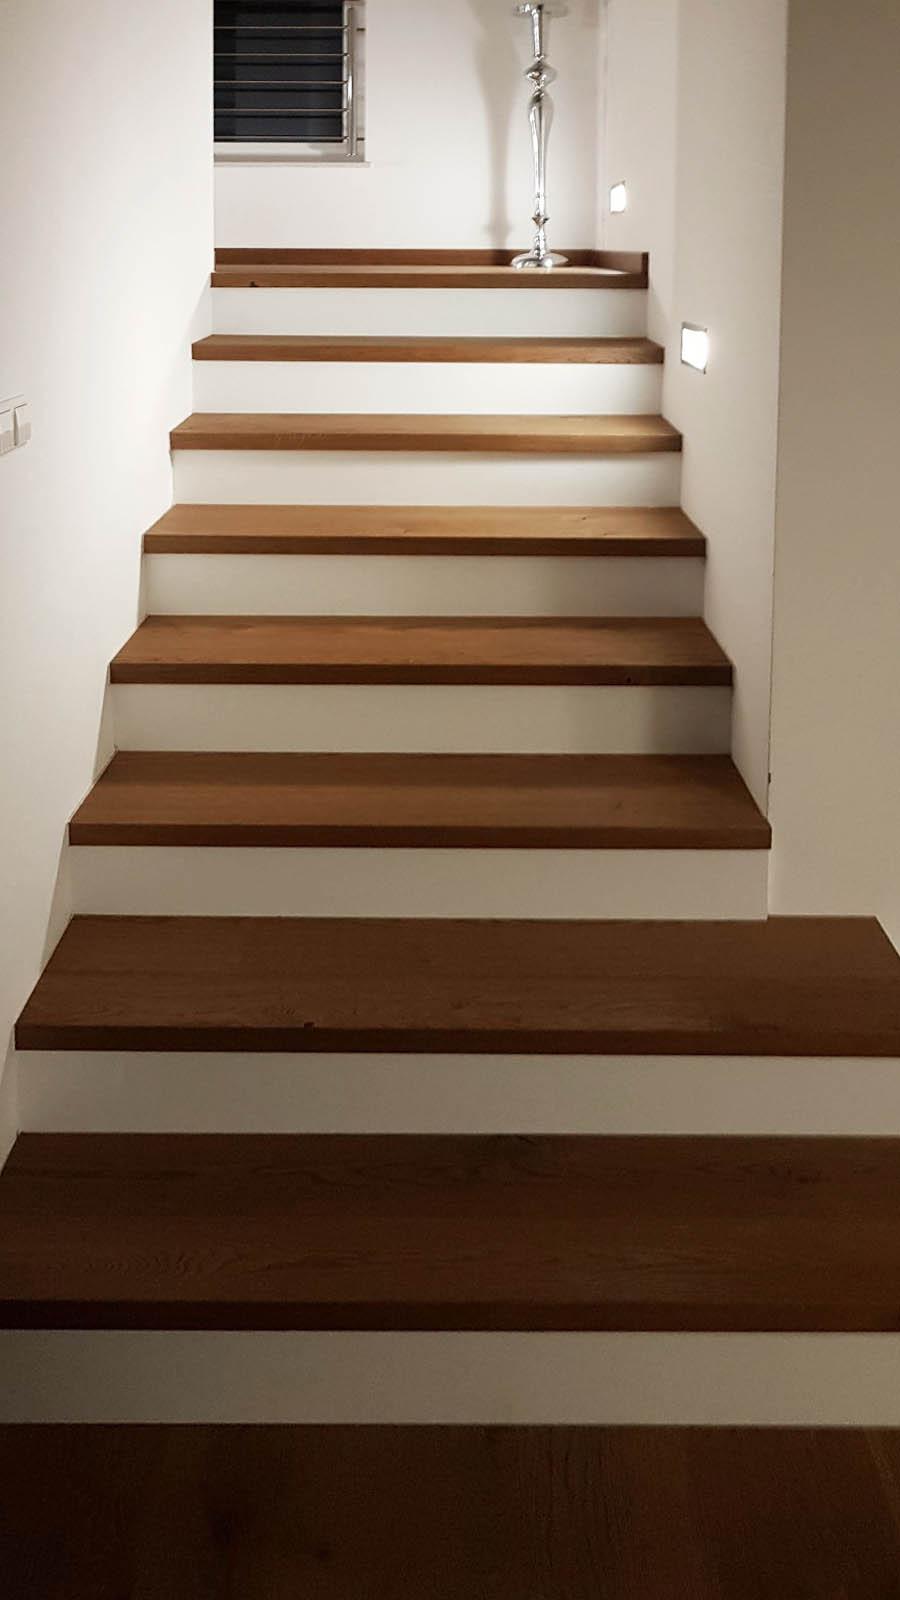 SIBau_interier_stairs_02